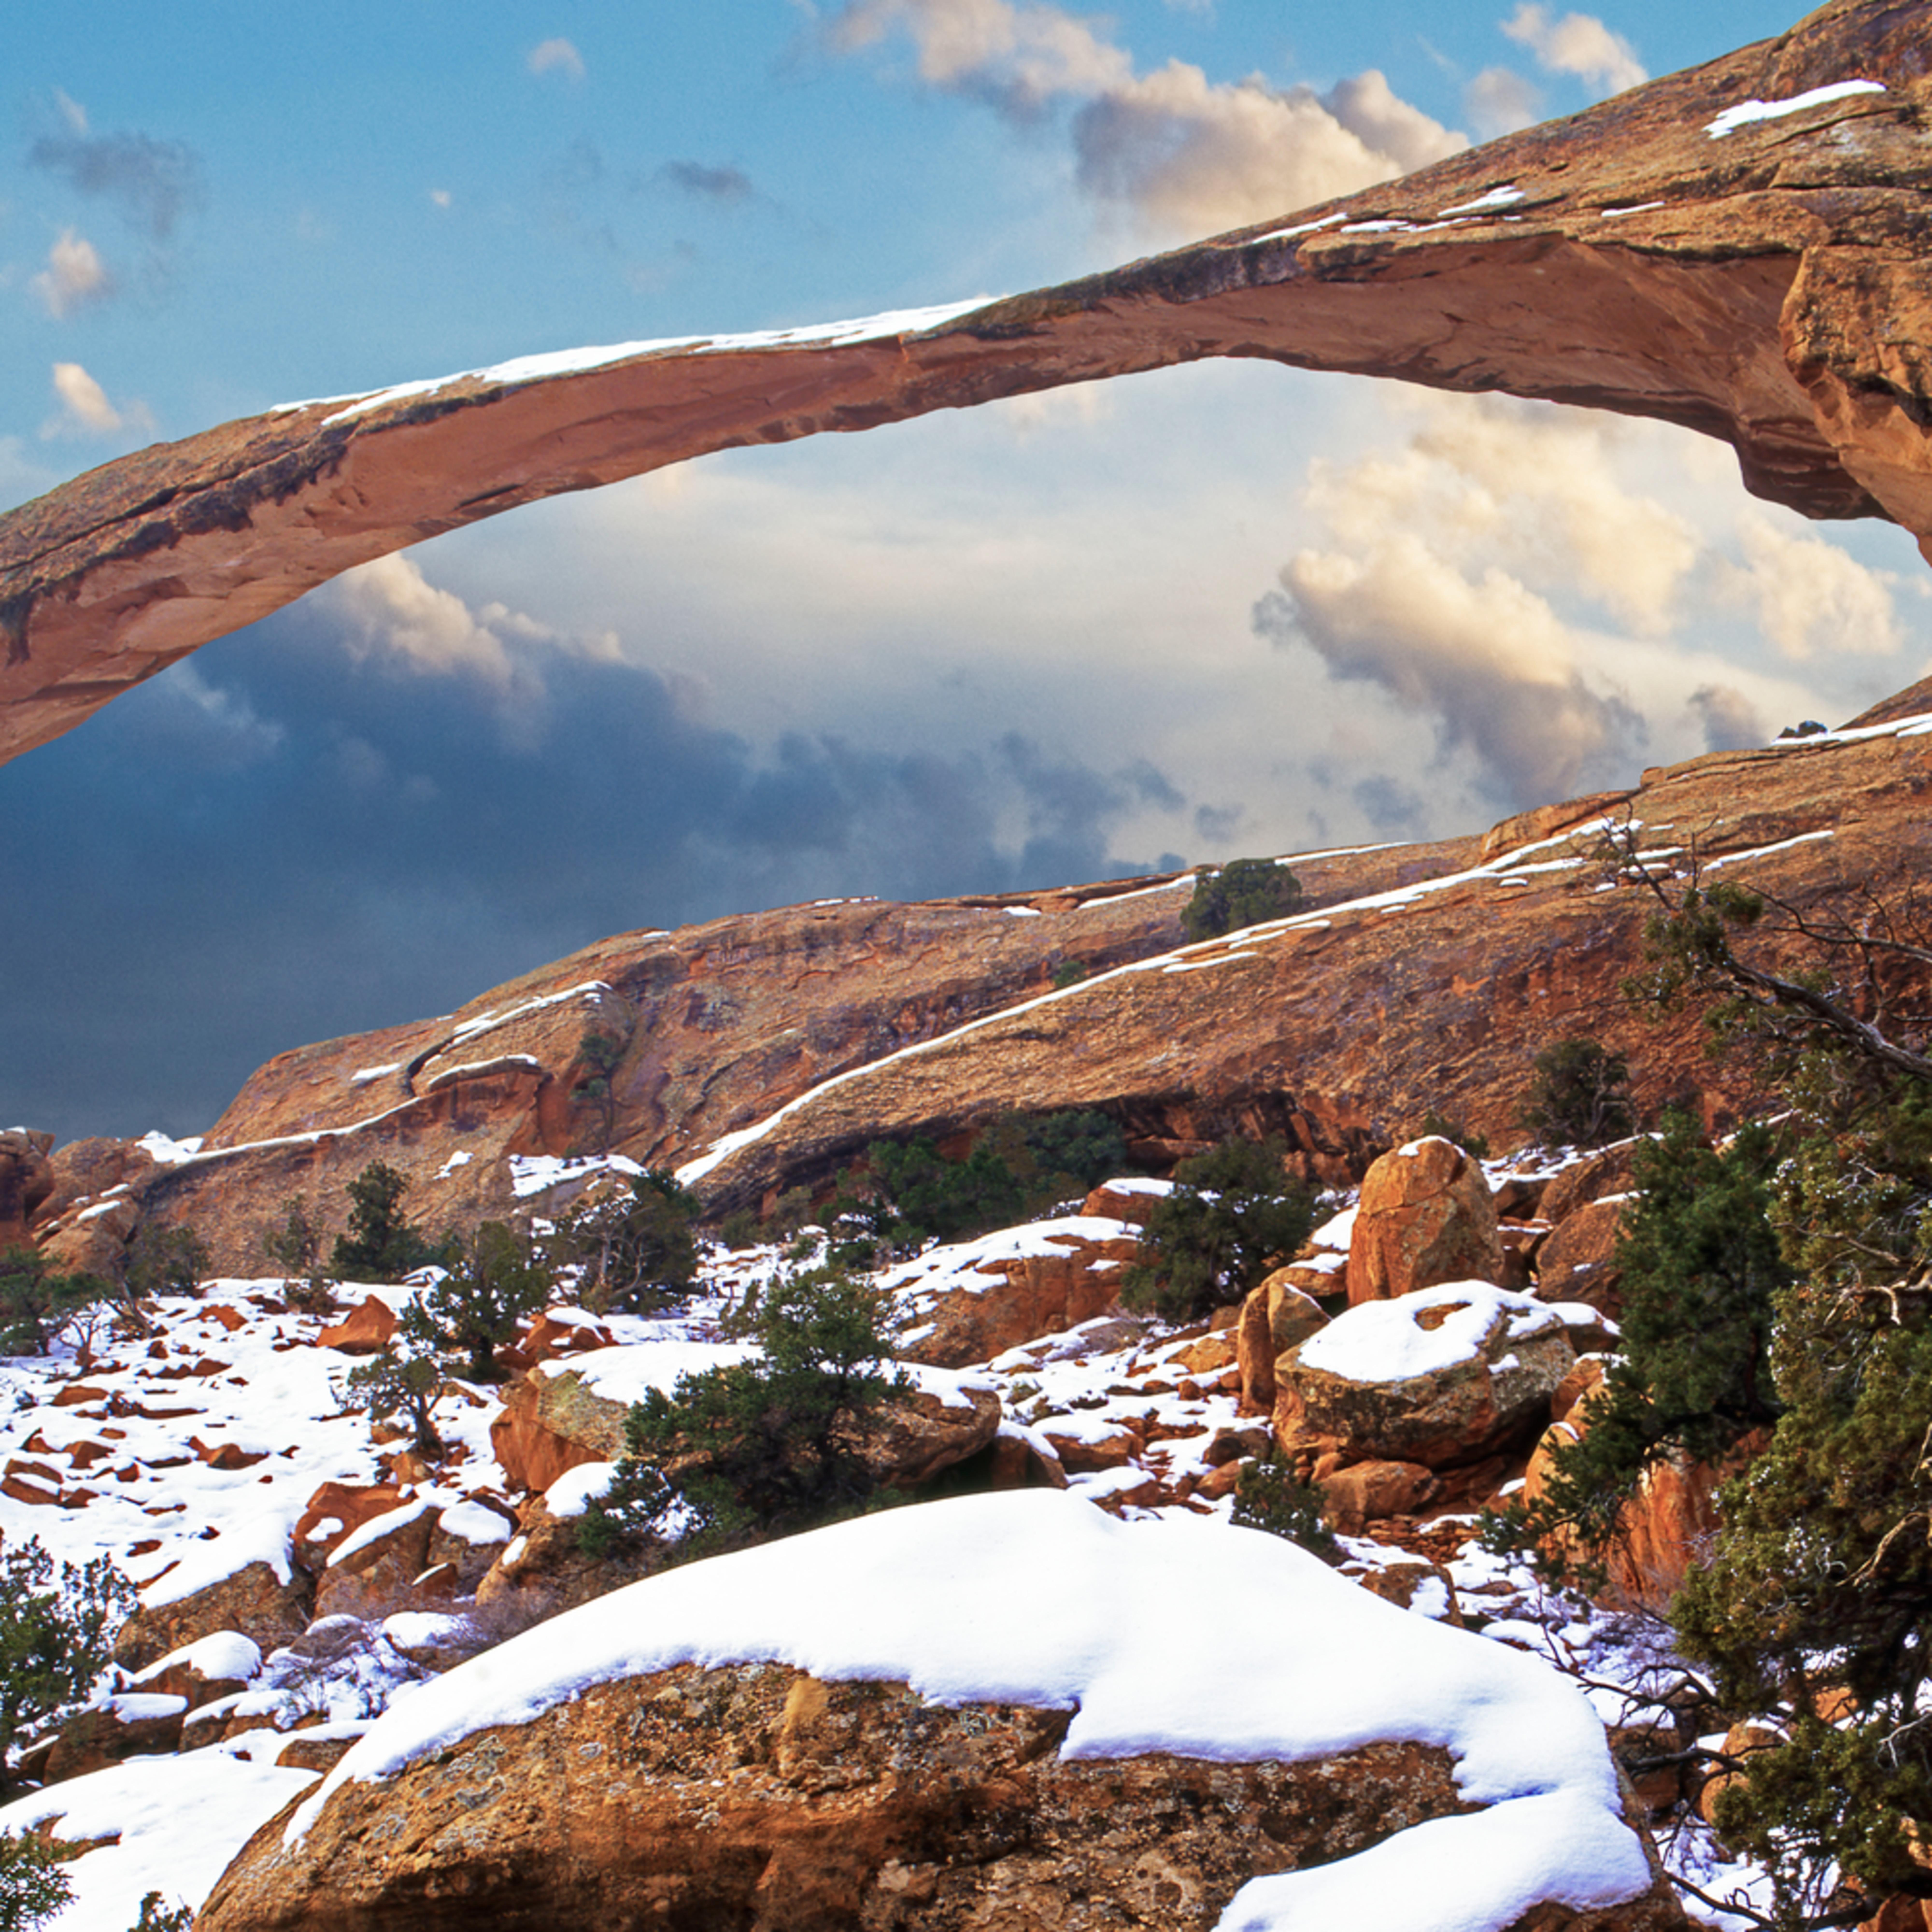 Landscape arch f72cna